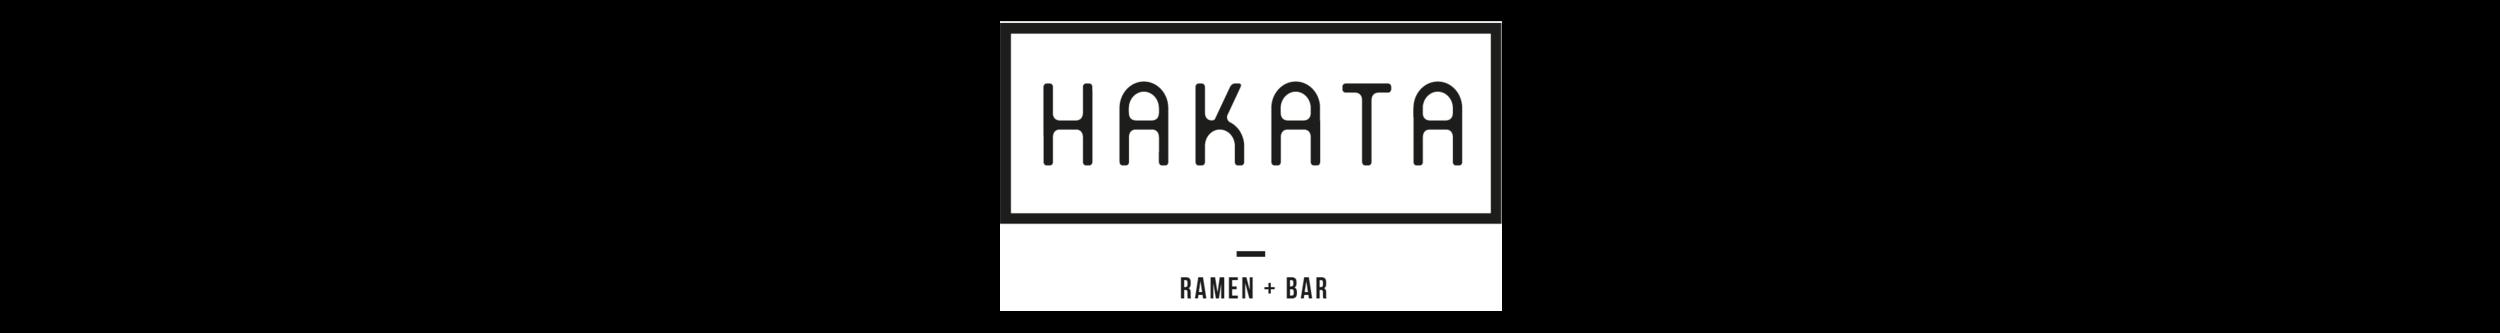 hakata_bar.png